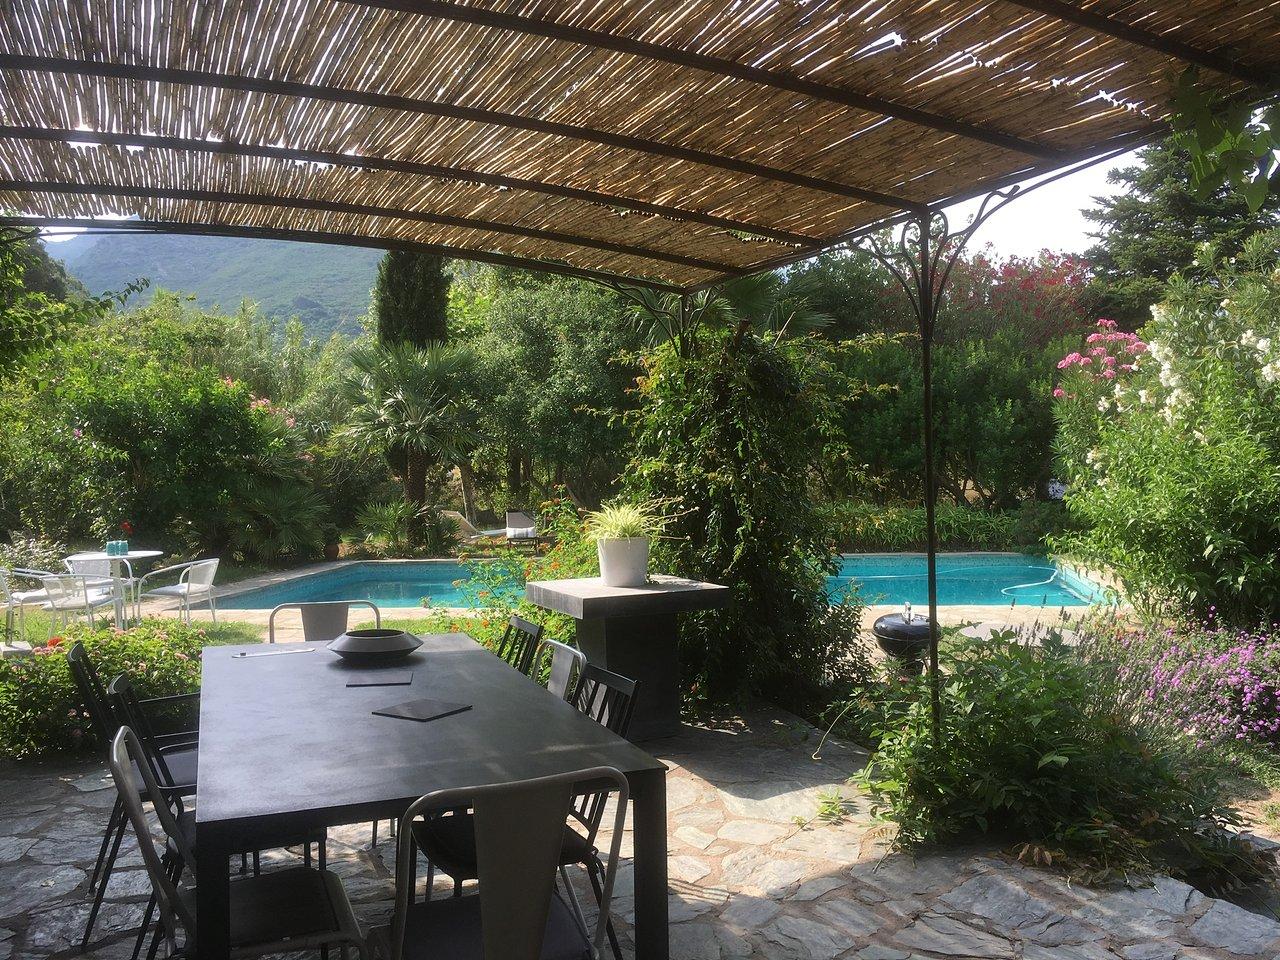 Les Jardins De Foata Prices Lodging Reviews Barbaggio